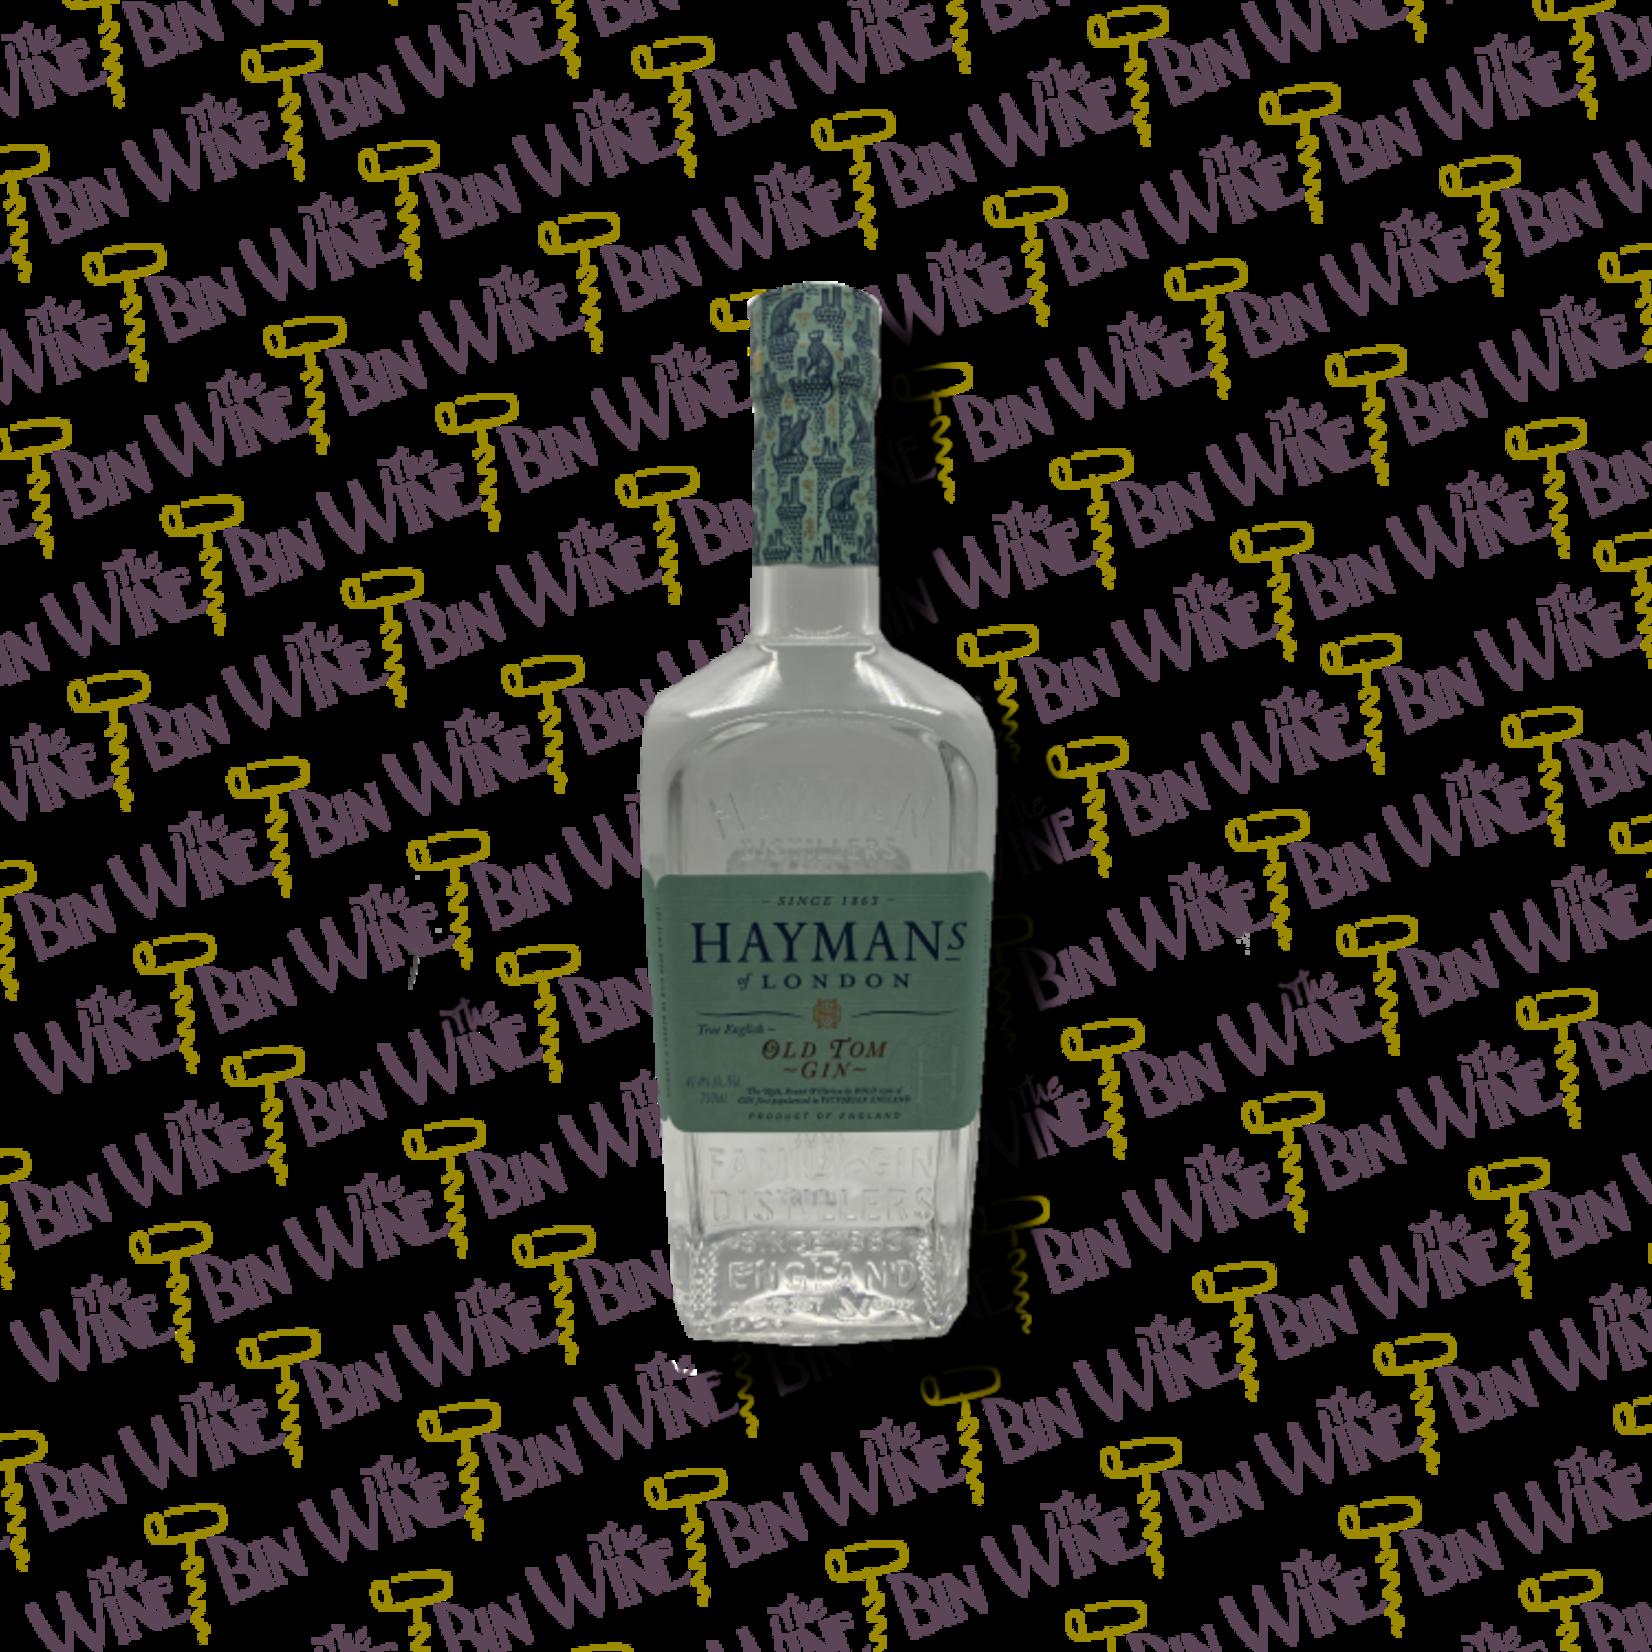 Hayman's Haymans Old Tom Gin – 750ml